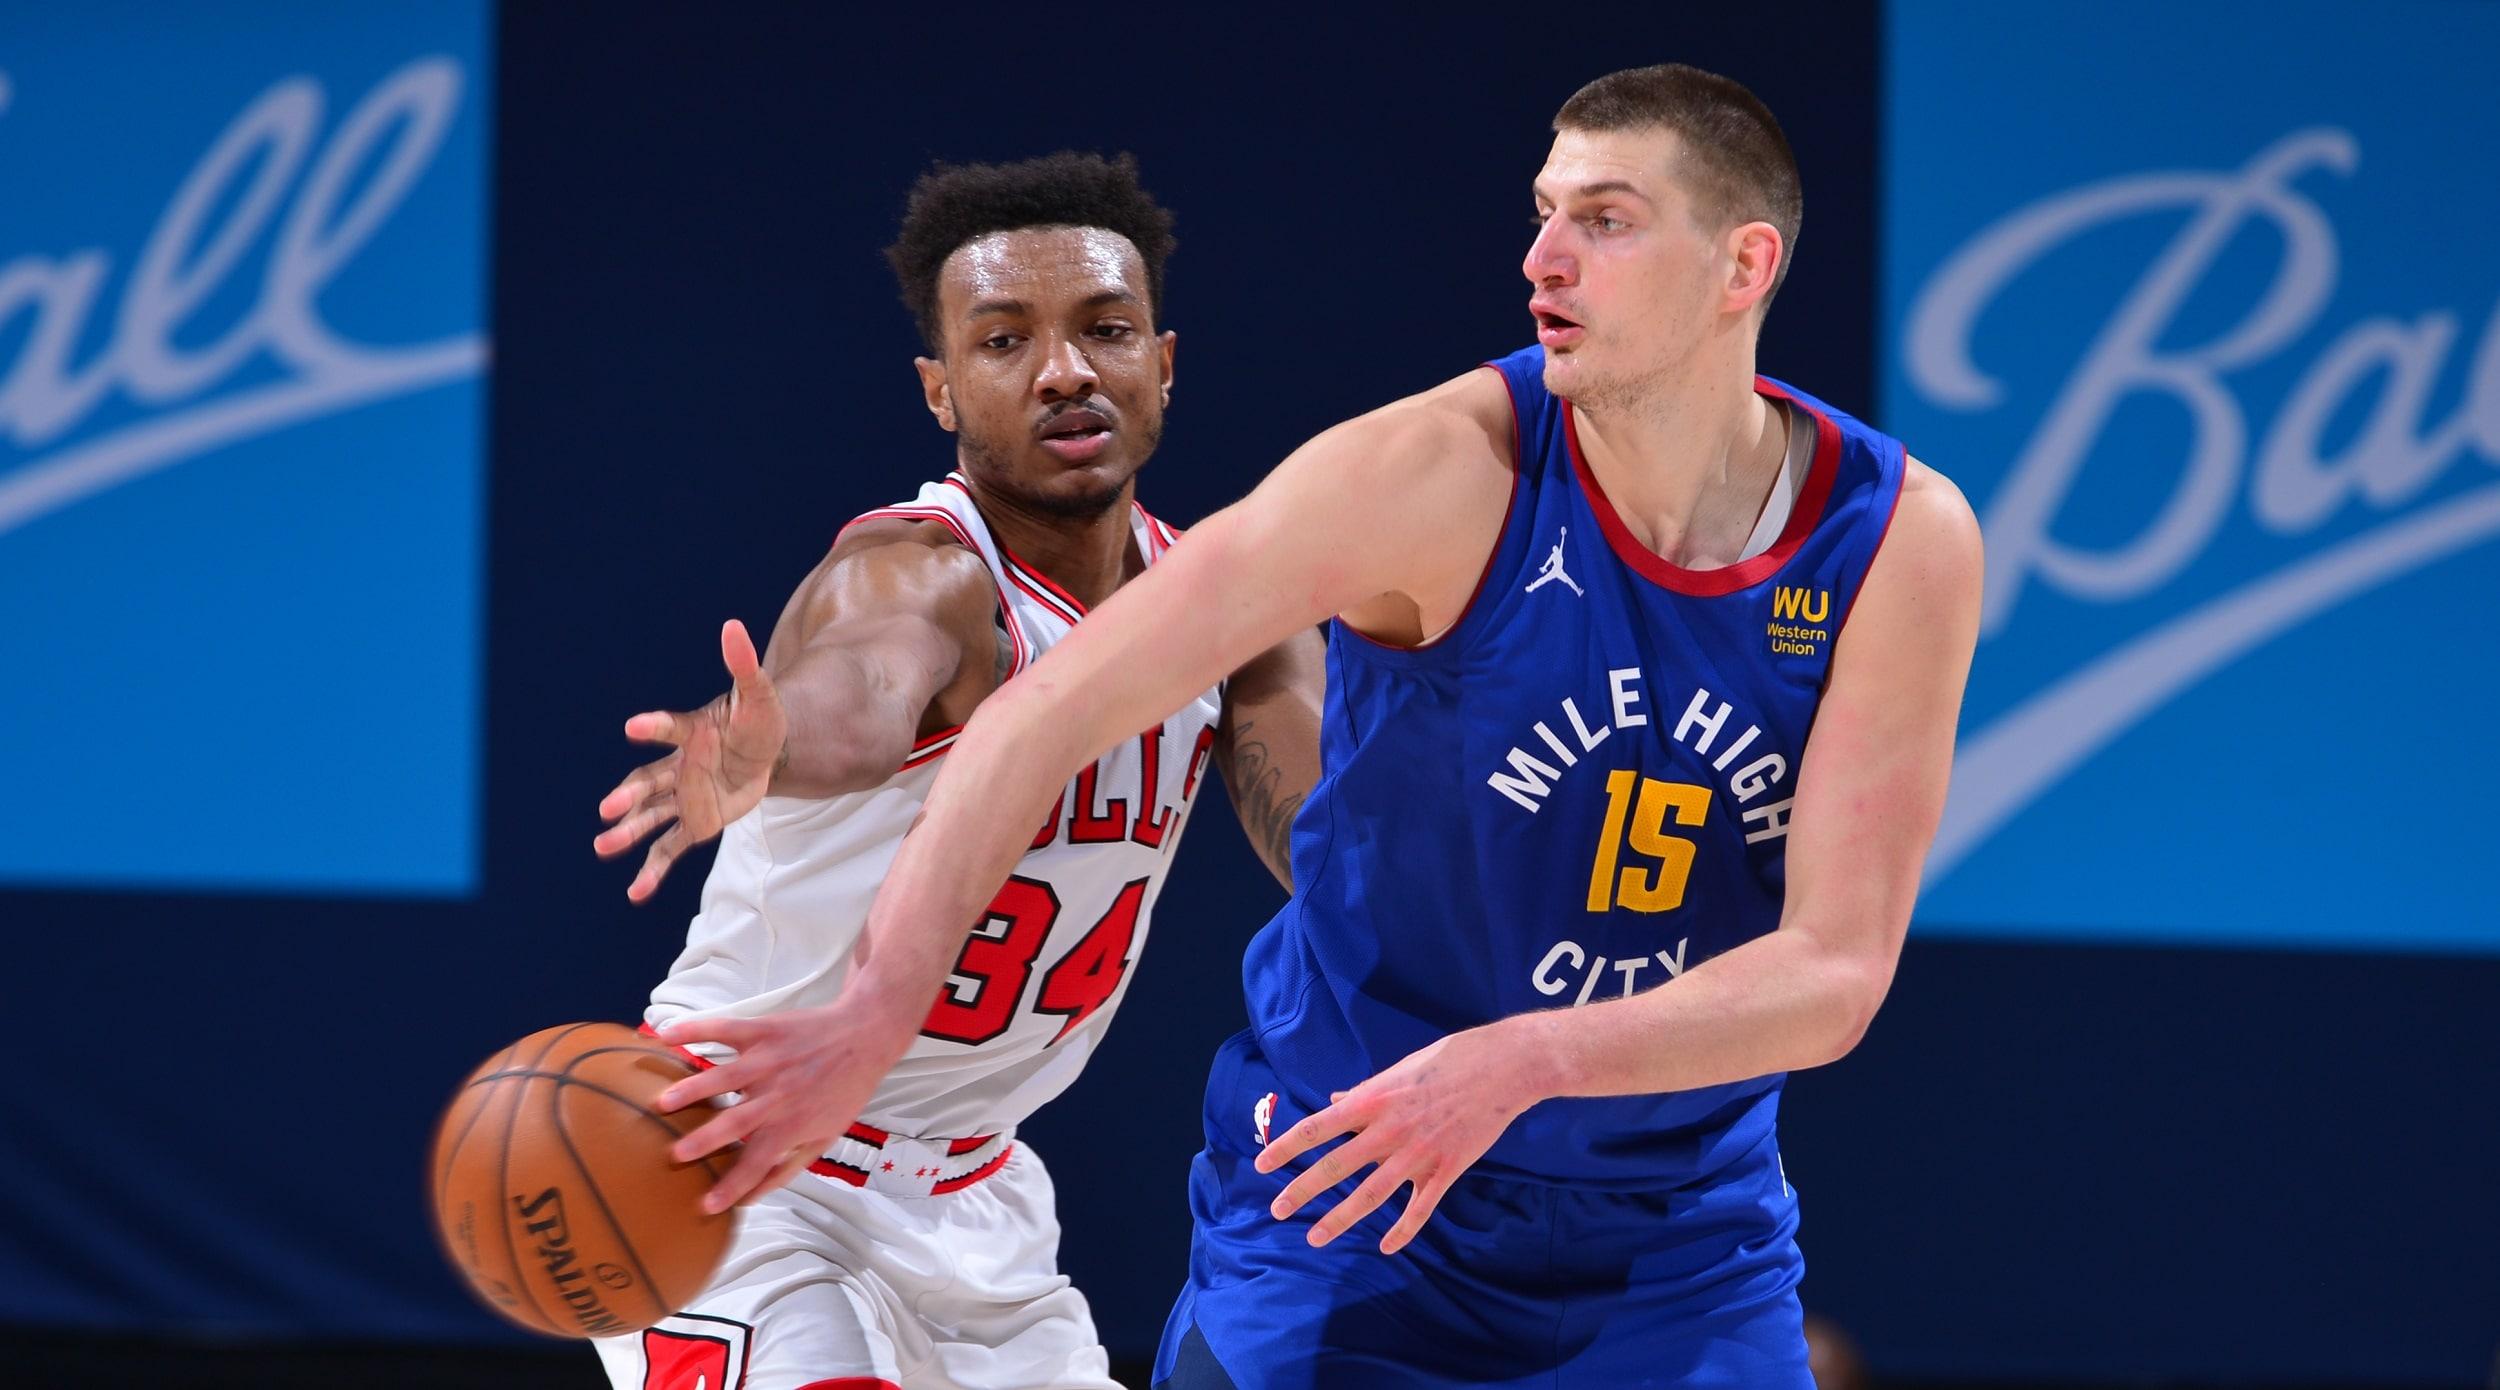 Denver Nuggets center Nikola Jokic captures 2020-21 Kia NBA MVP